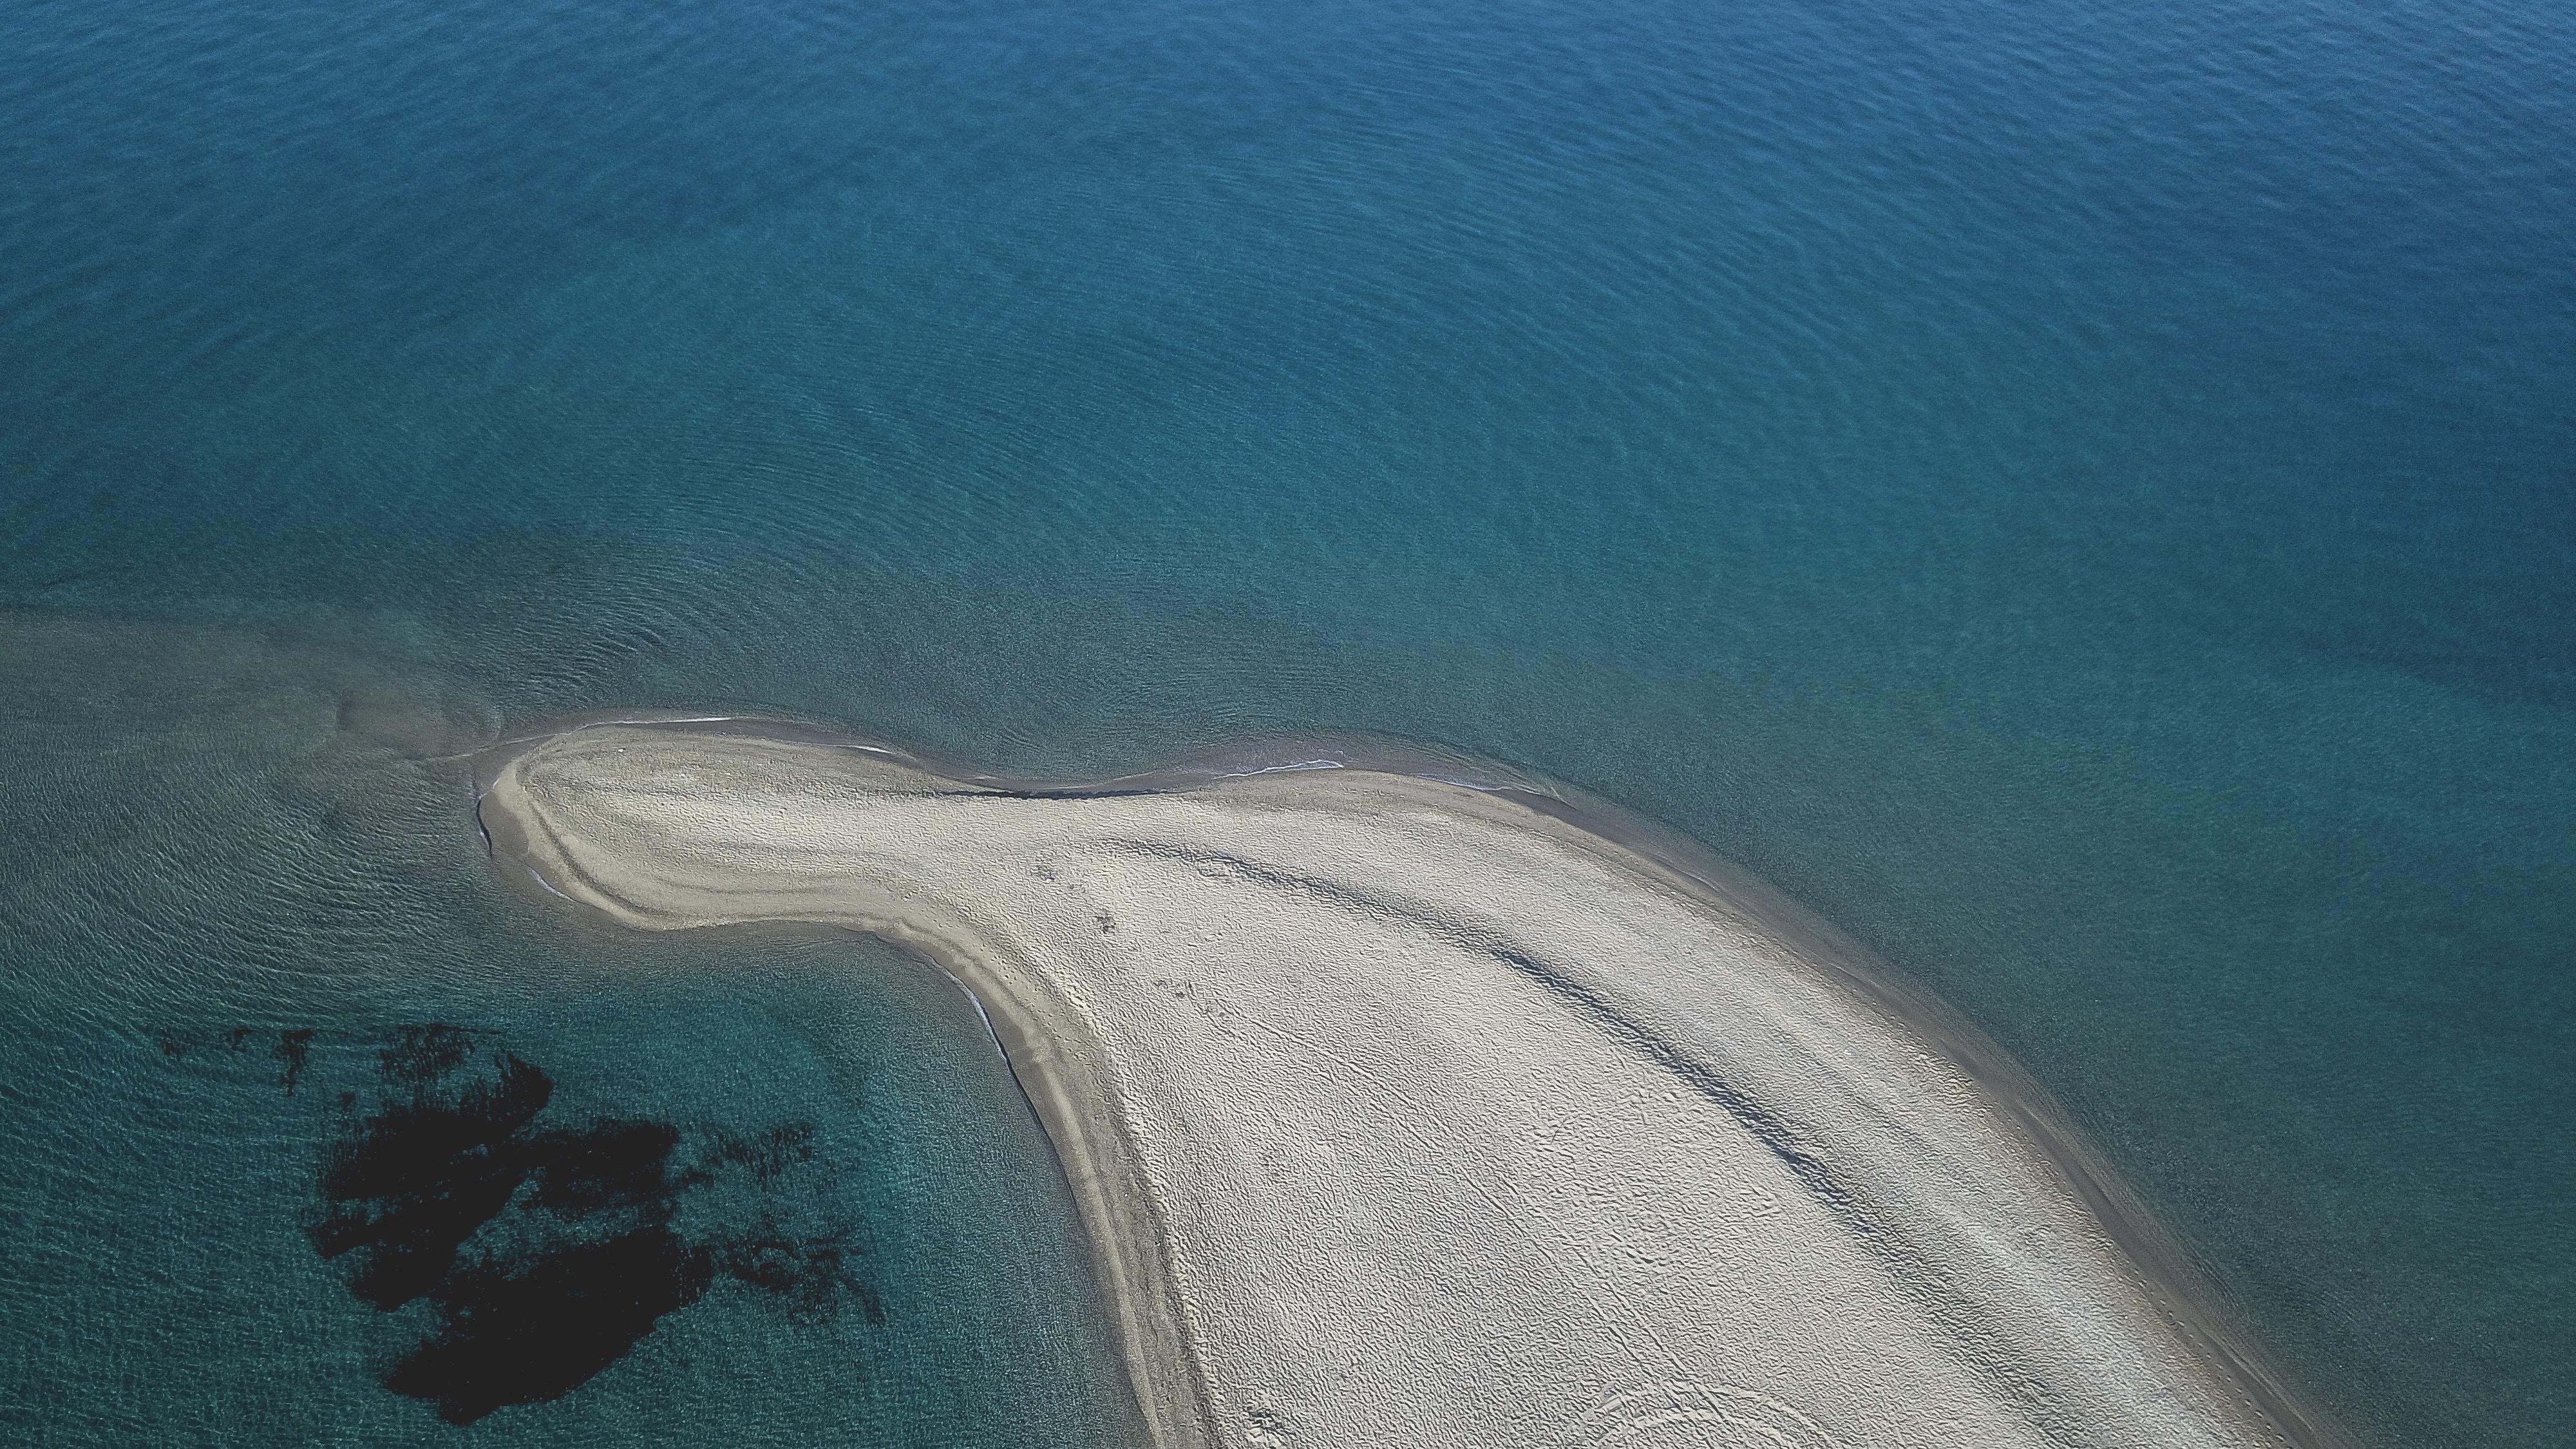 Drone shot of sand in clear blue ocean, Μύτη Ποσειδίου